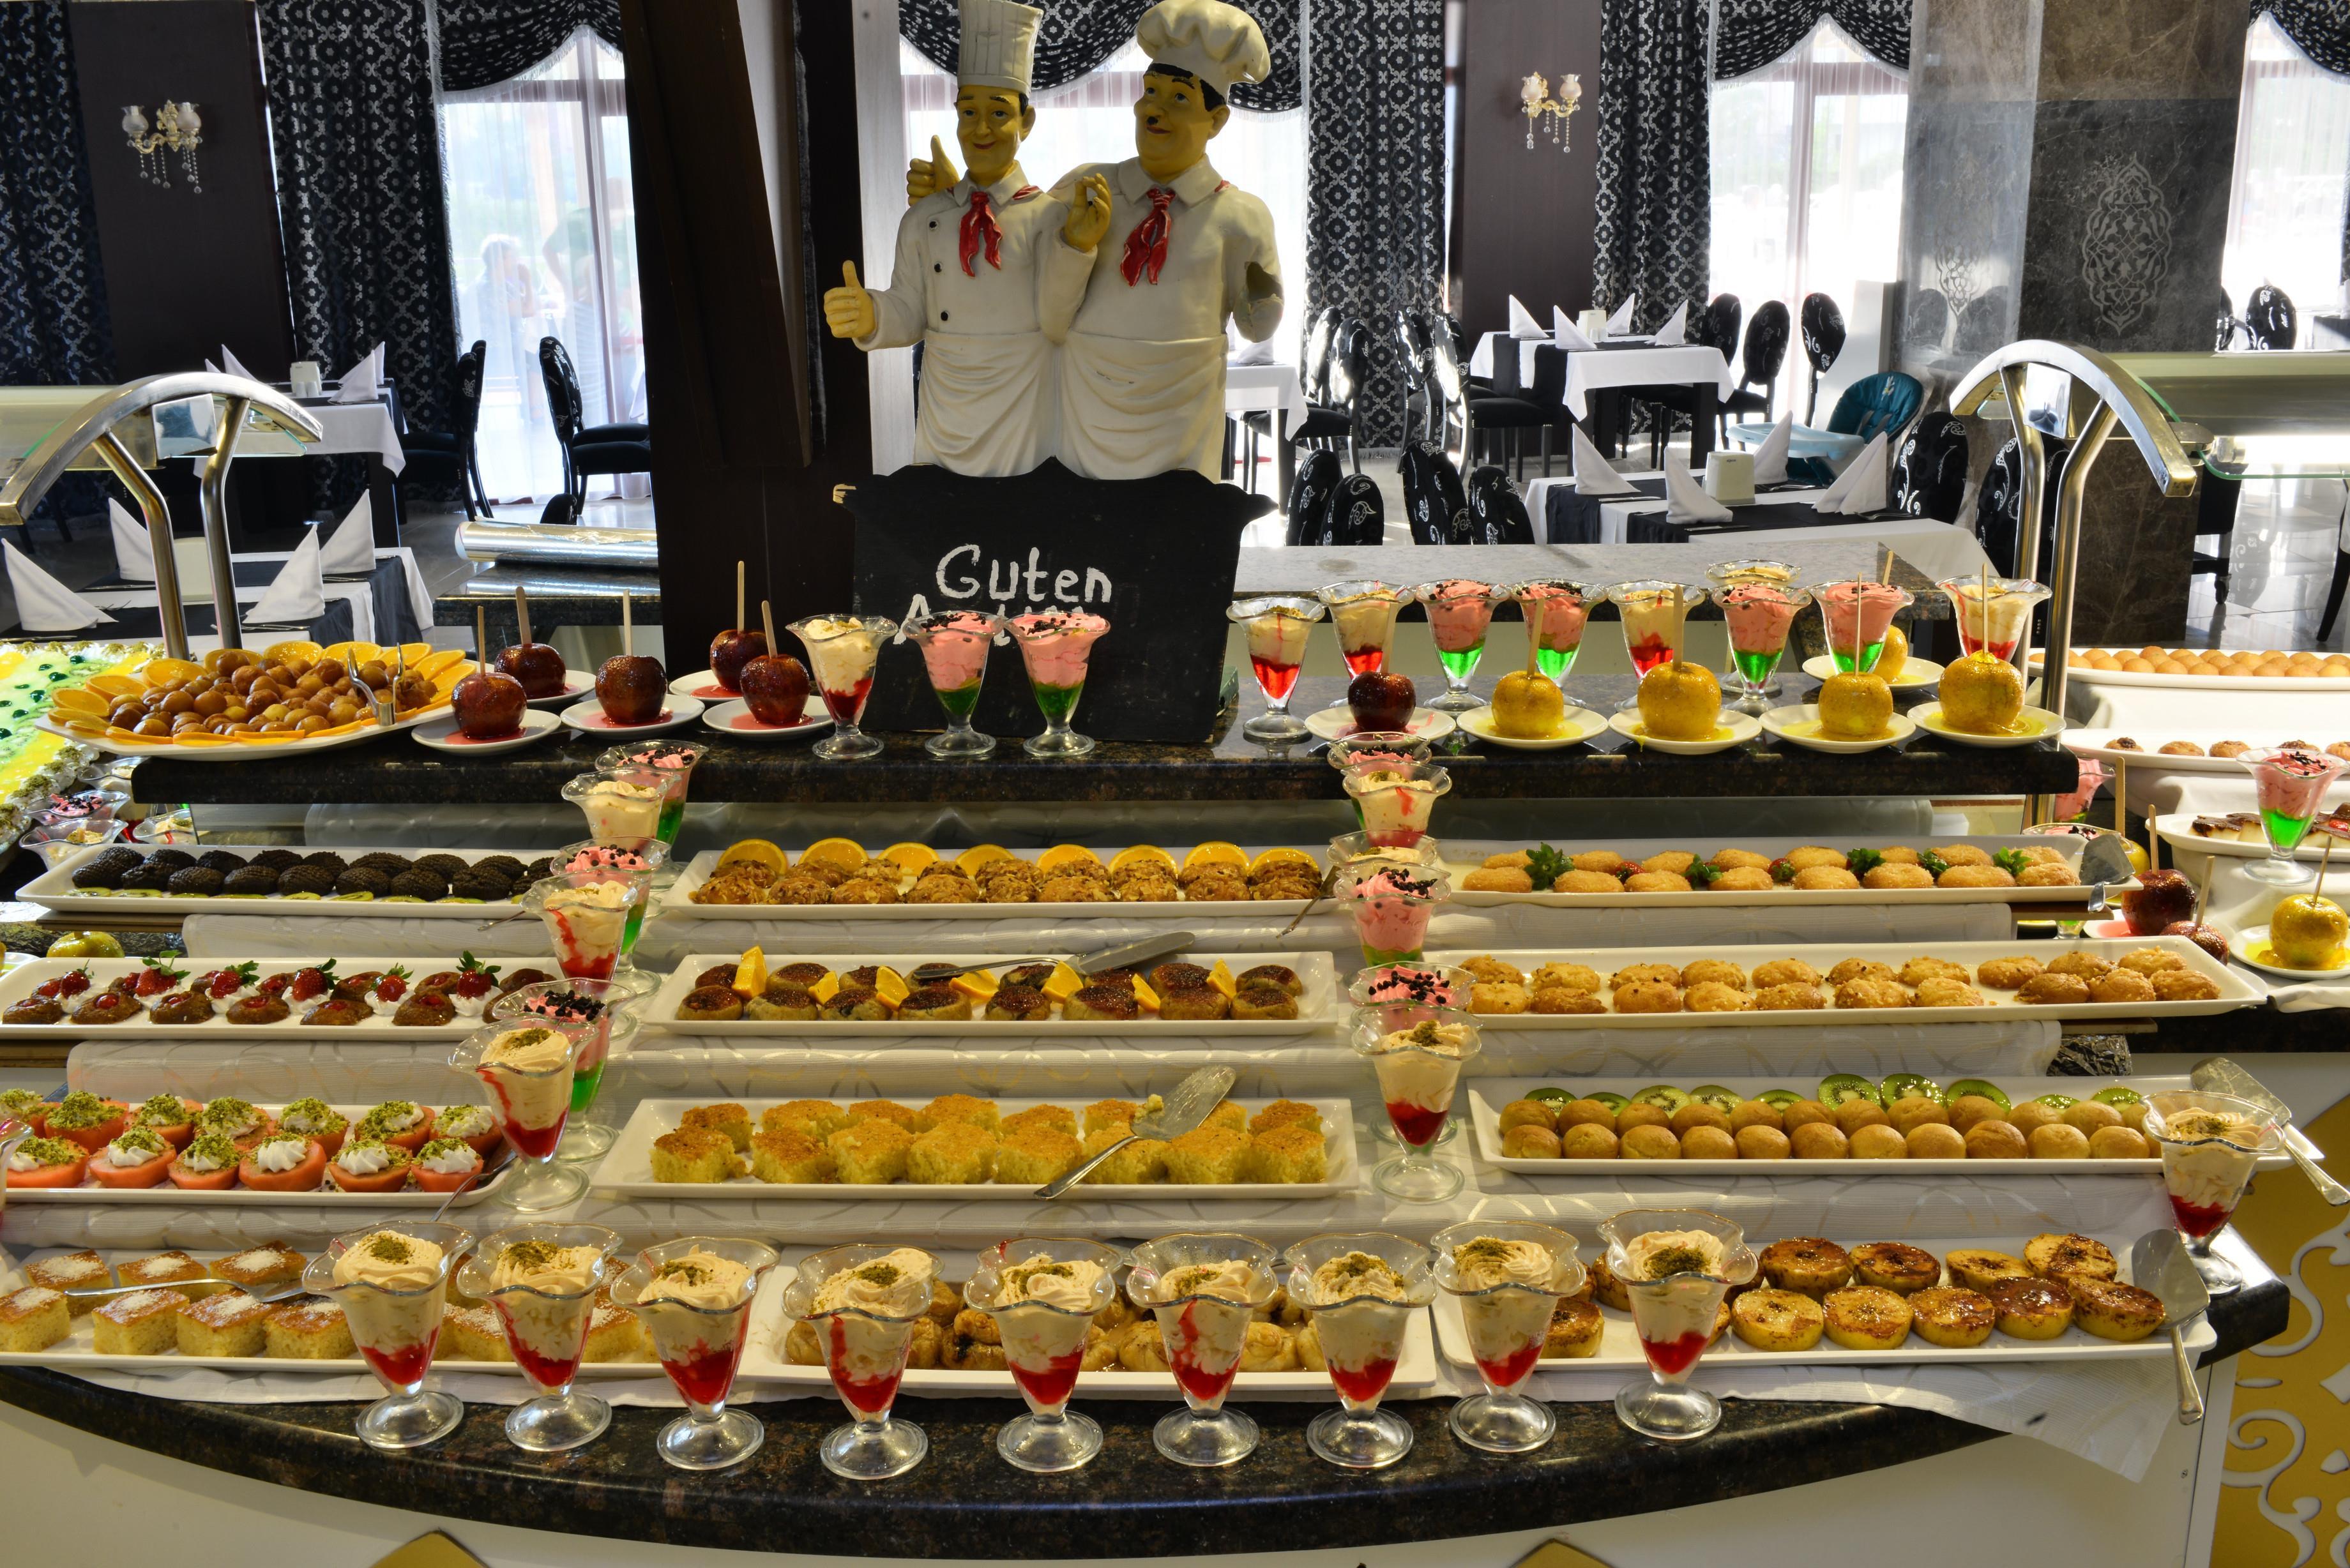 http://www.orextravel.sk/OREX/hotelphotos/side-royal-paradise-general-0033.jpg